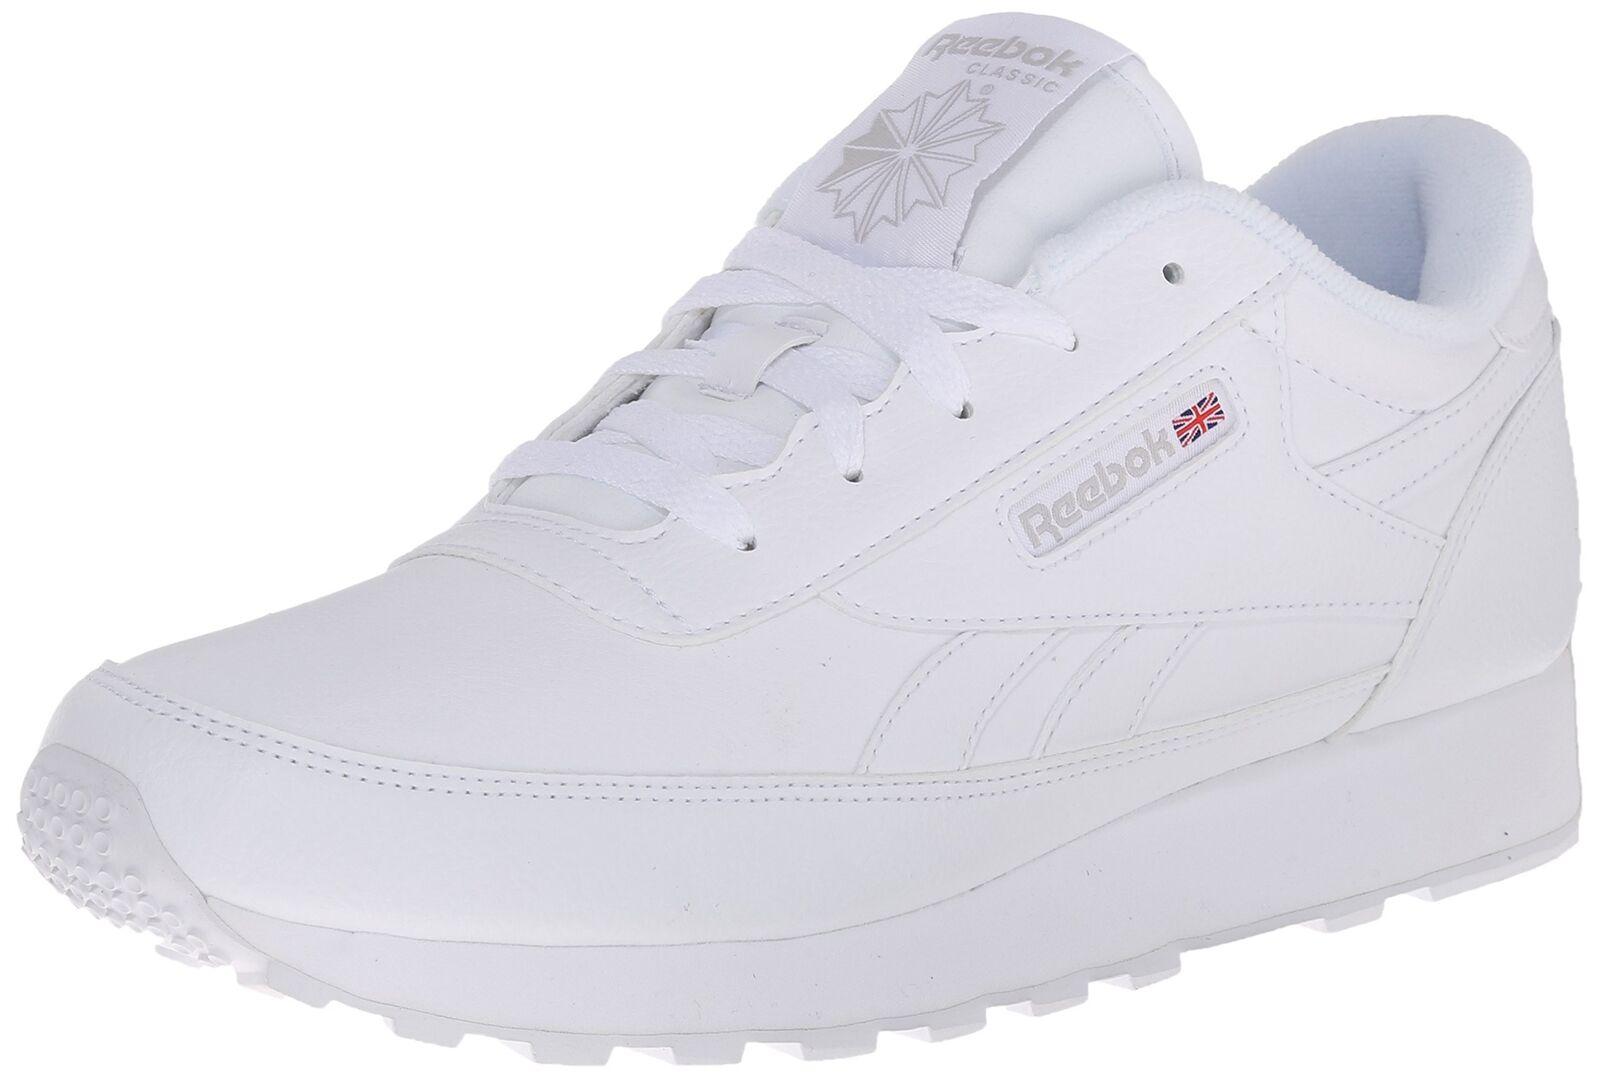 Reebok Women's Classic Renaissance Sneaker Us-white/Steel 9 B(M) US